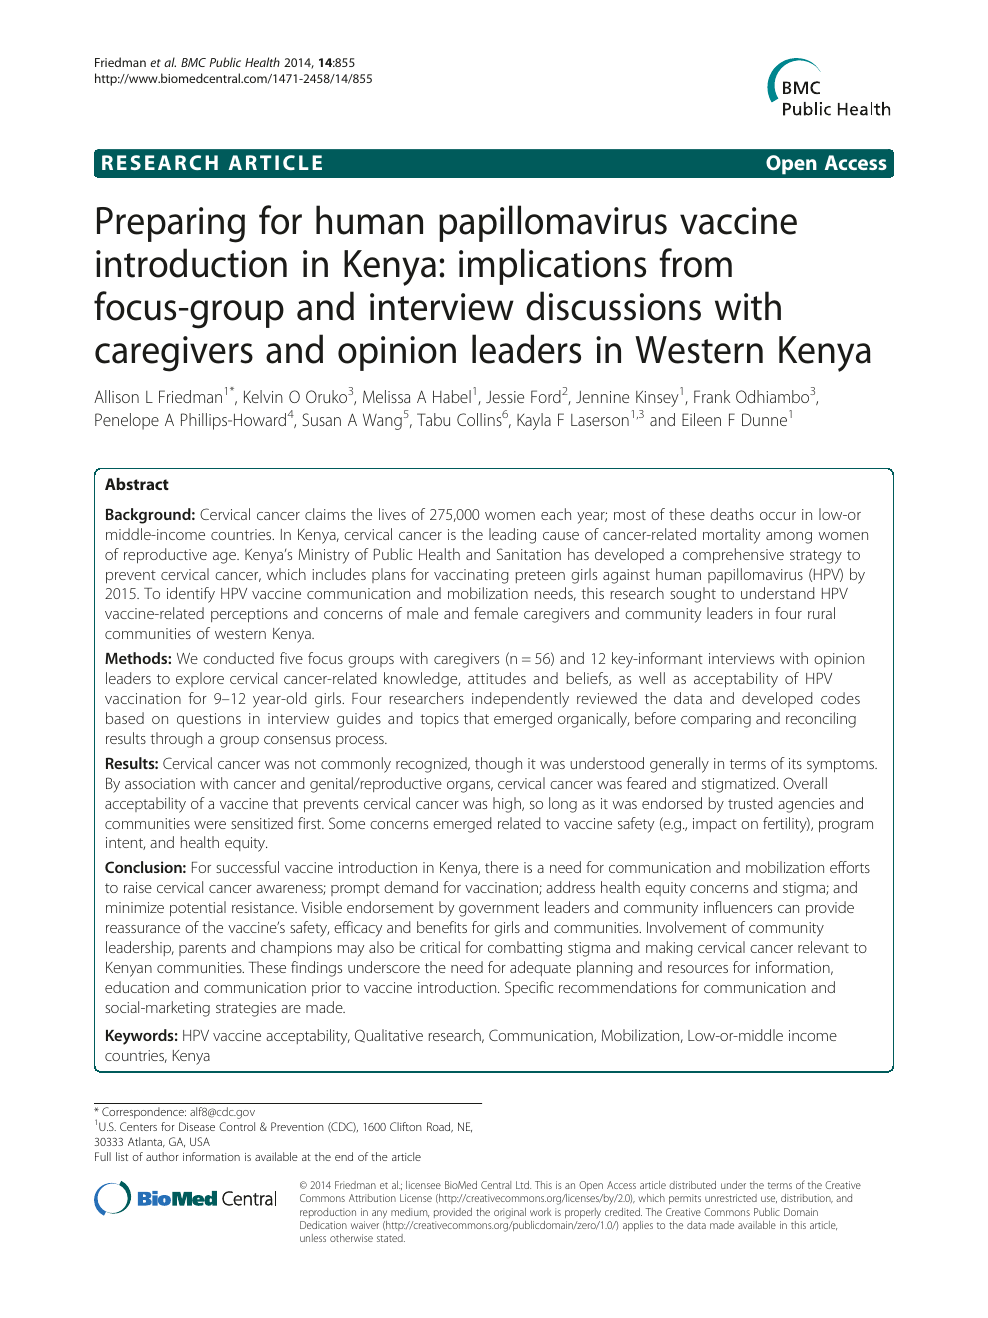 human papillomavirus vaccine opinions casca de casca